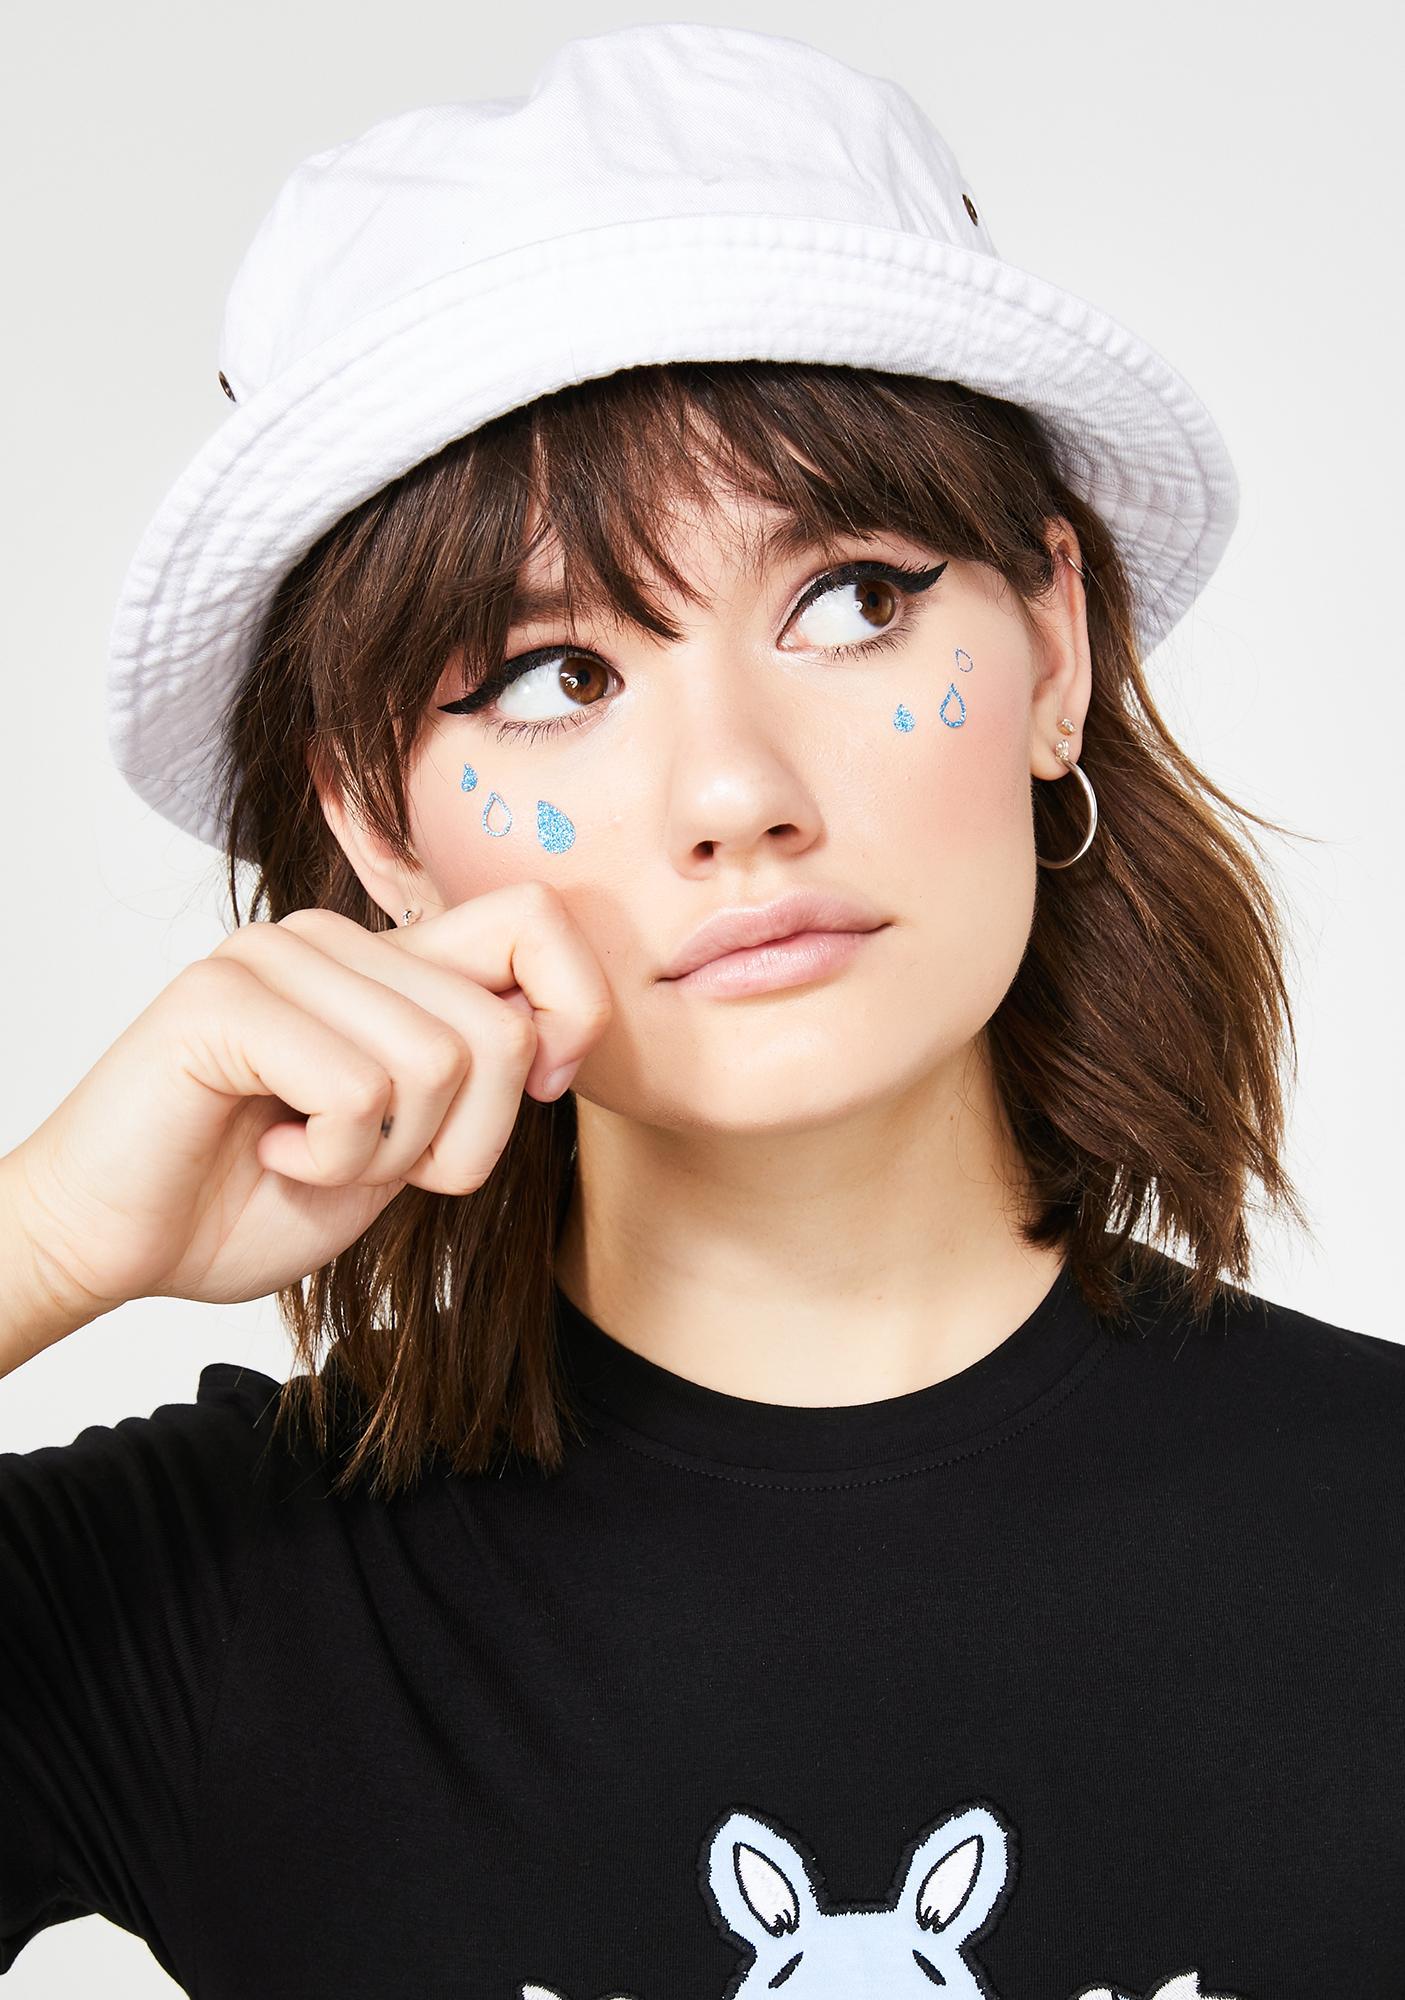 Stinnys Teardrop Body N' Face Stickers